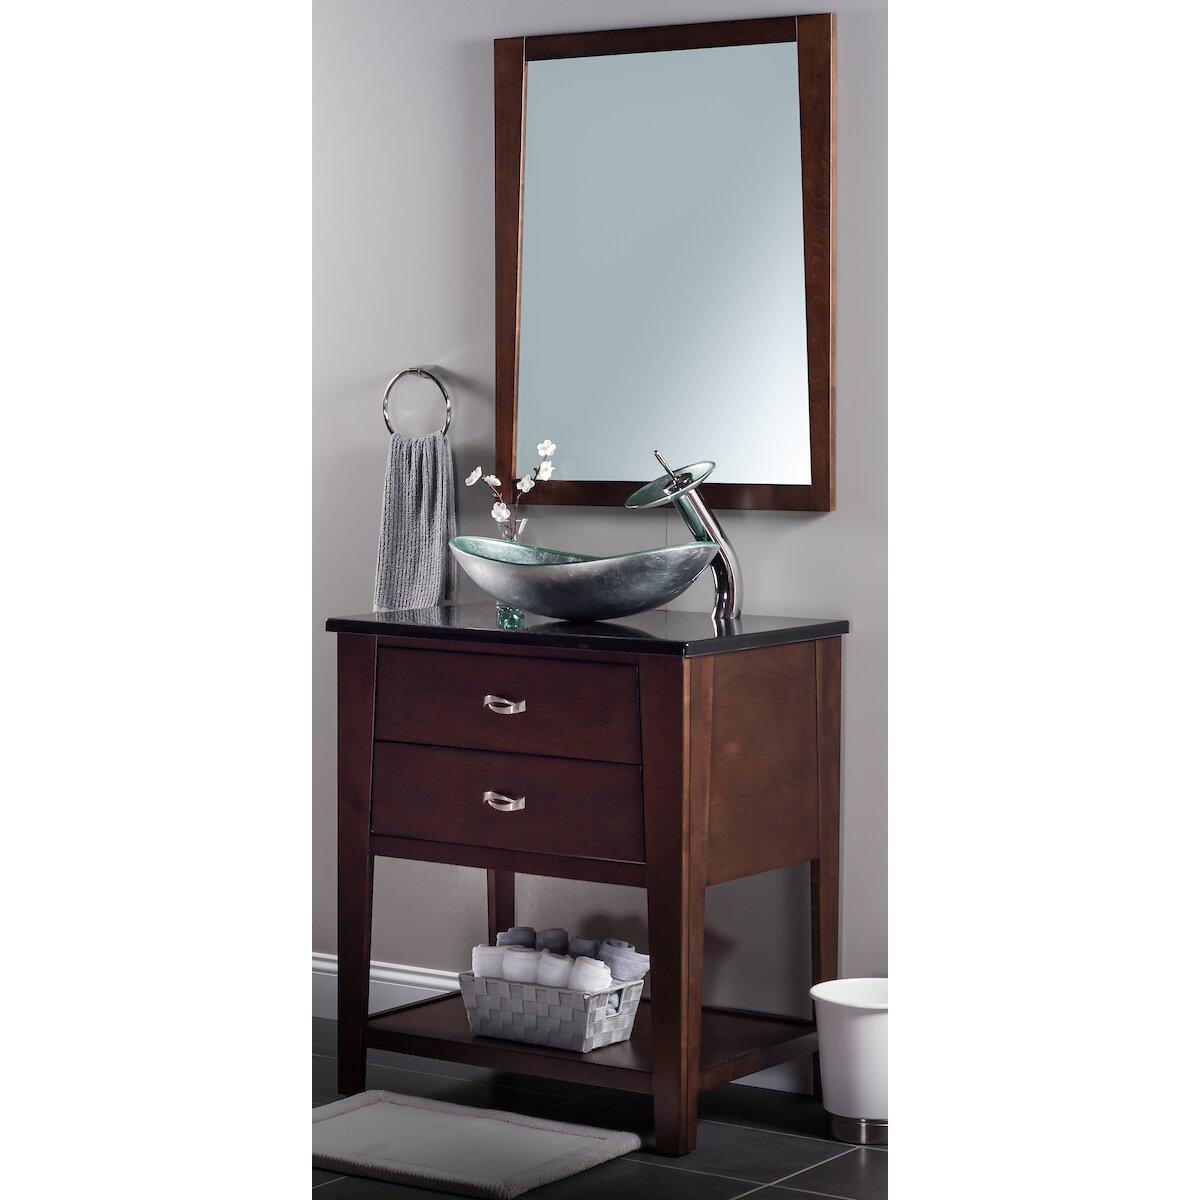 Novatto argento oval vessel bathroom sink set for Bath toilet and sink sets